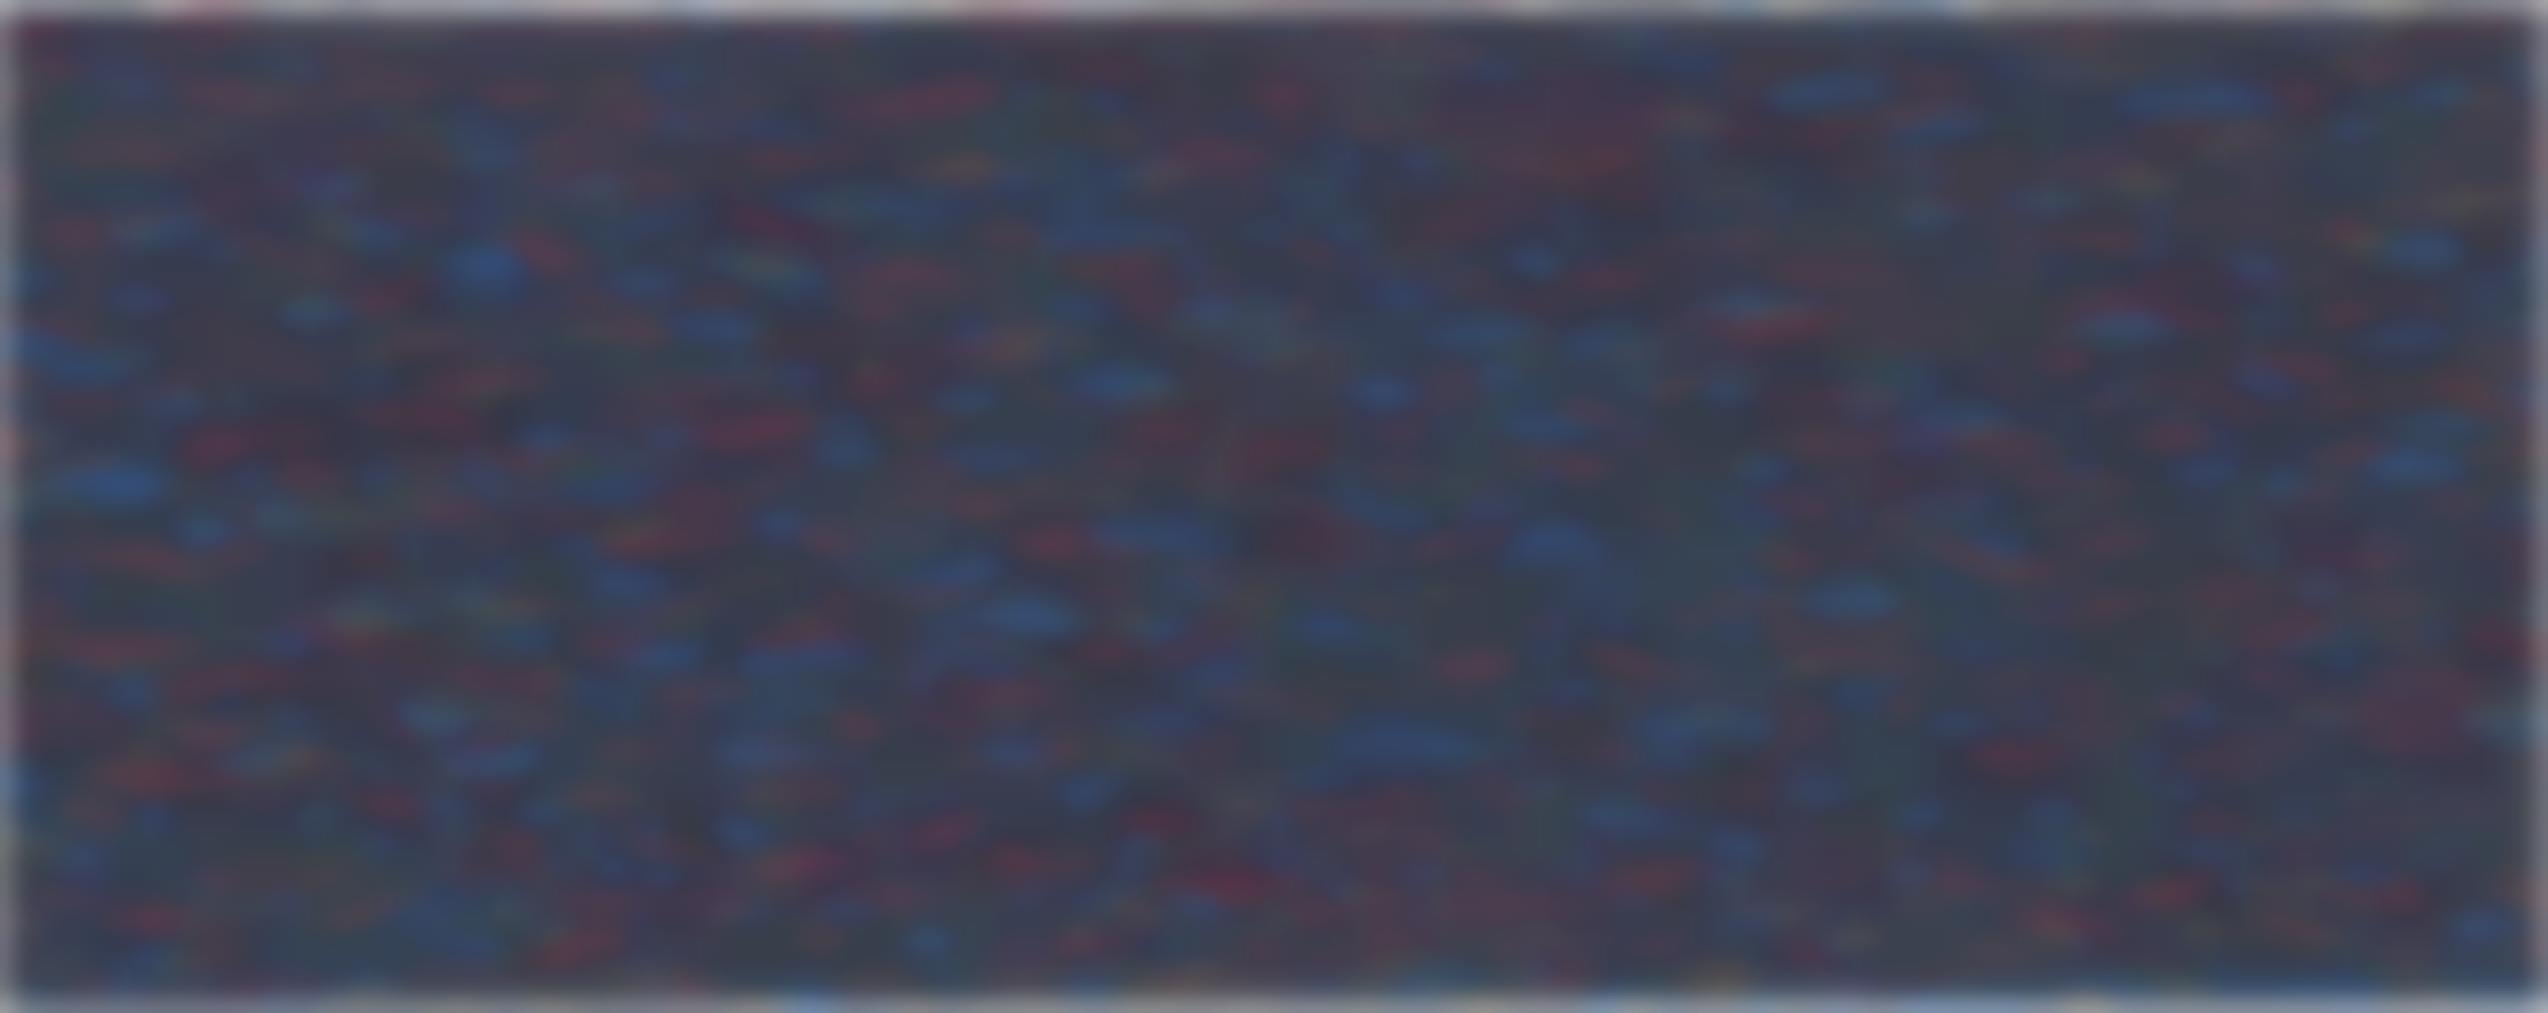 Sol LeWitt-Horizontal Brushstrokes-2003